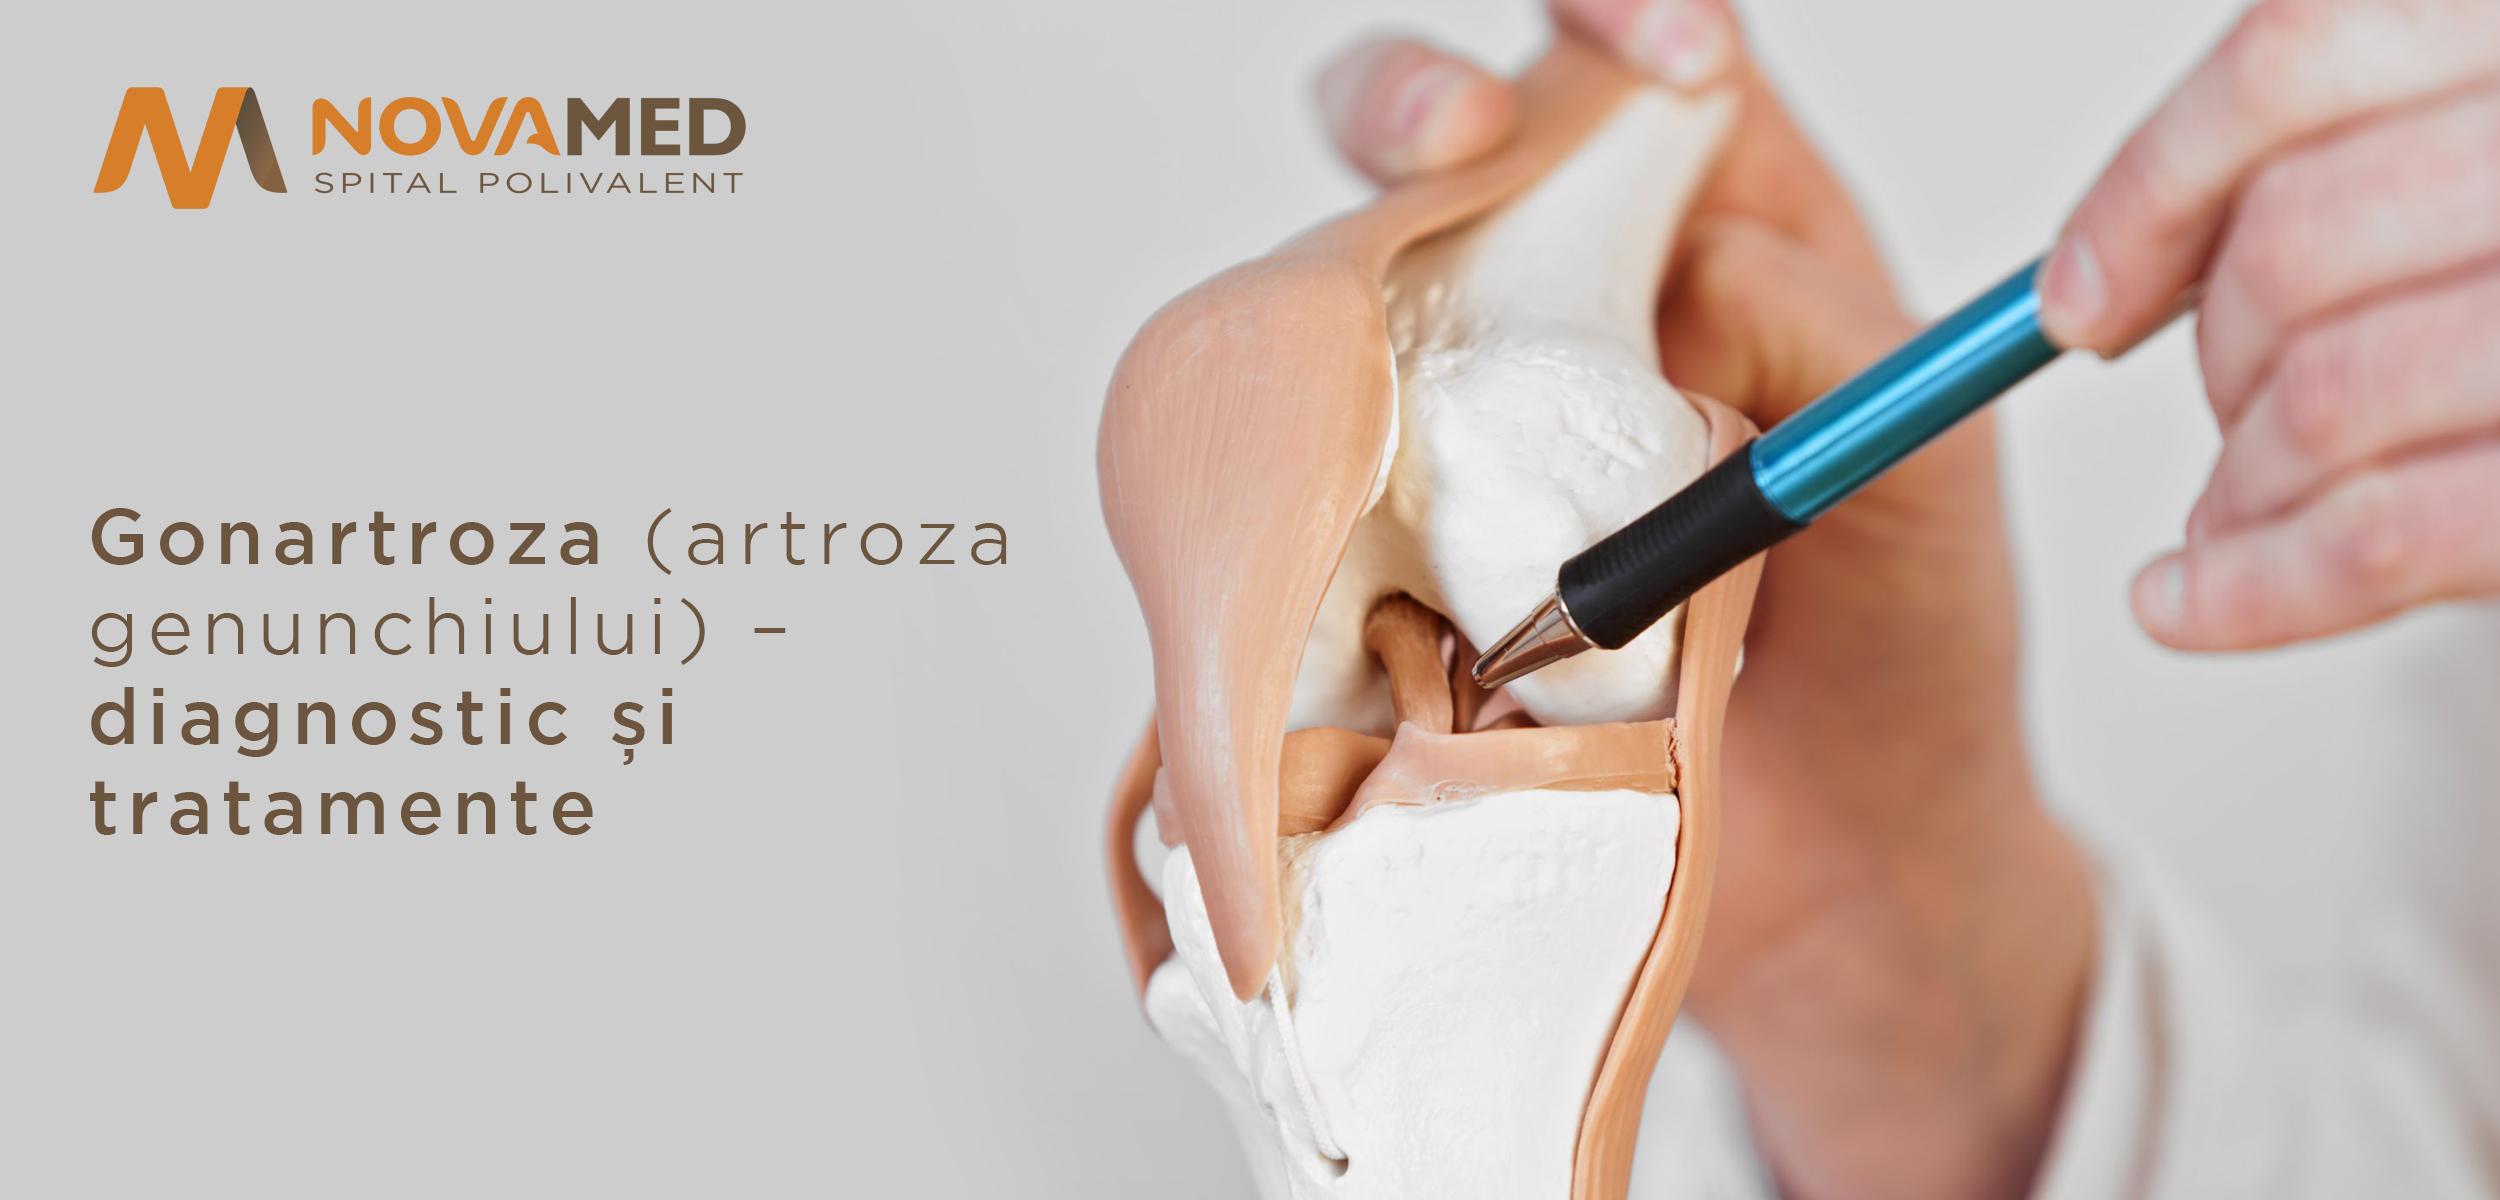 Plasmolifting cu artroză a genunchiului recenzii - sfantipa.ro